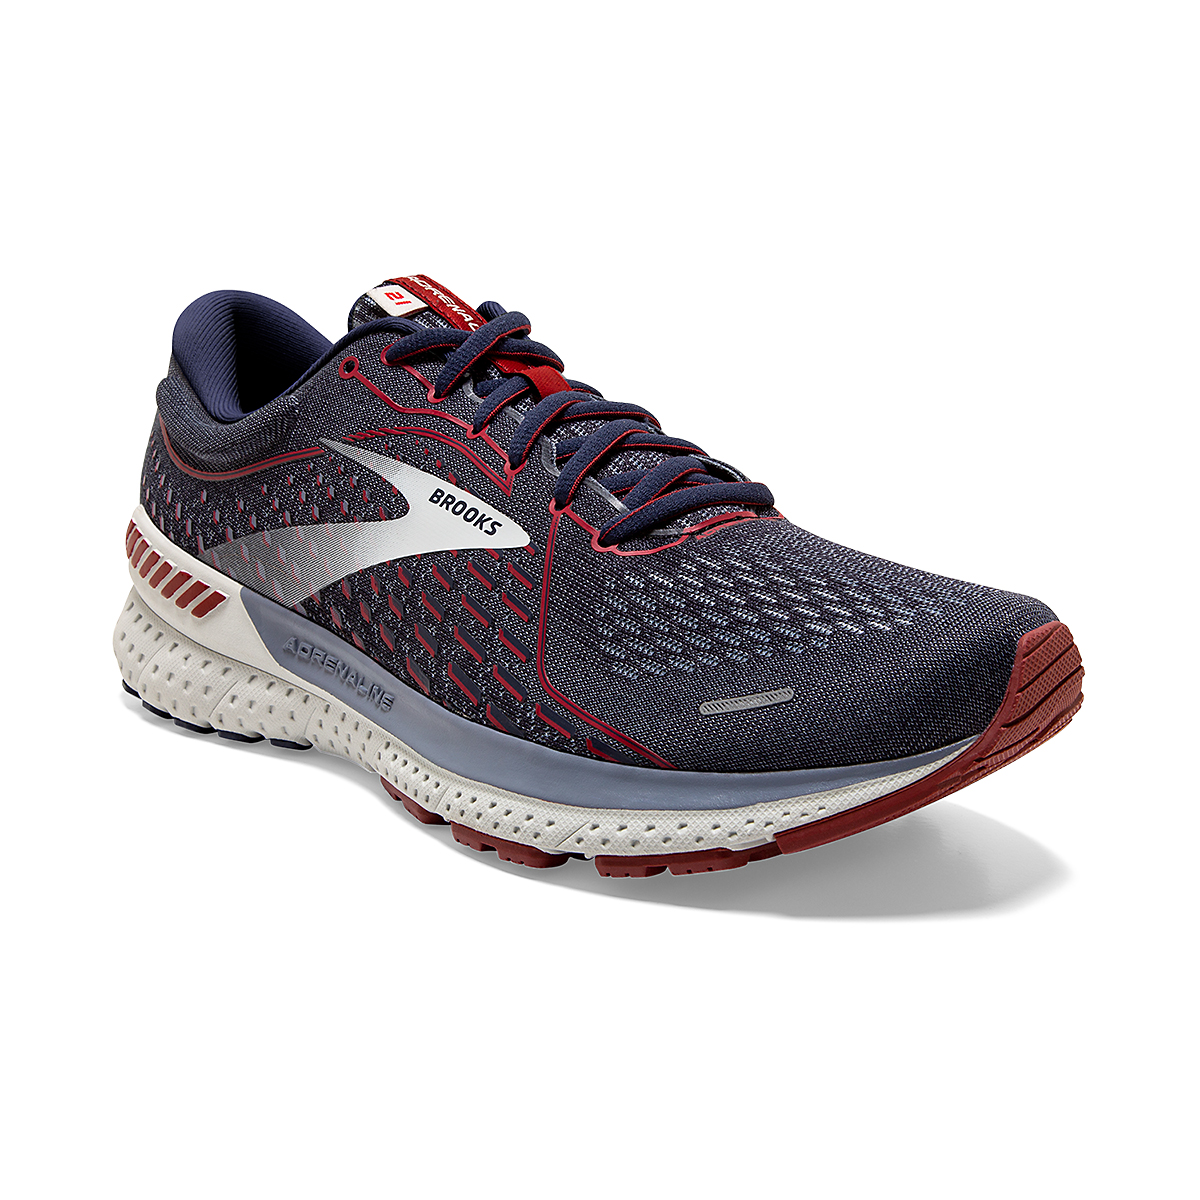 Men's Brooks Adrenaline GTS 21 Running Shoe - Color: Peacoat/Grey/Red - Size: 7 - Width: Regular, Peacoat/Grey/Red, large, image 4